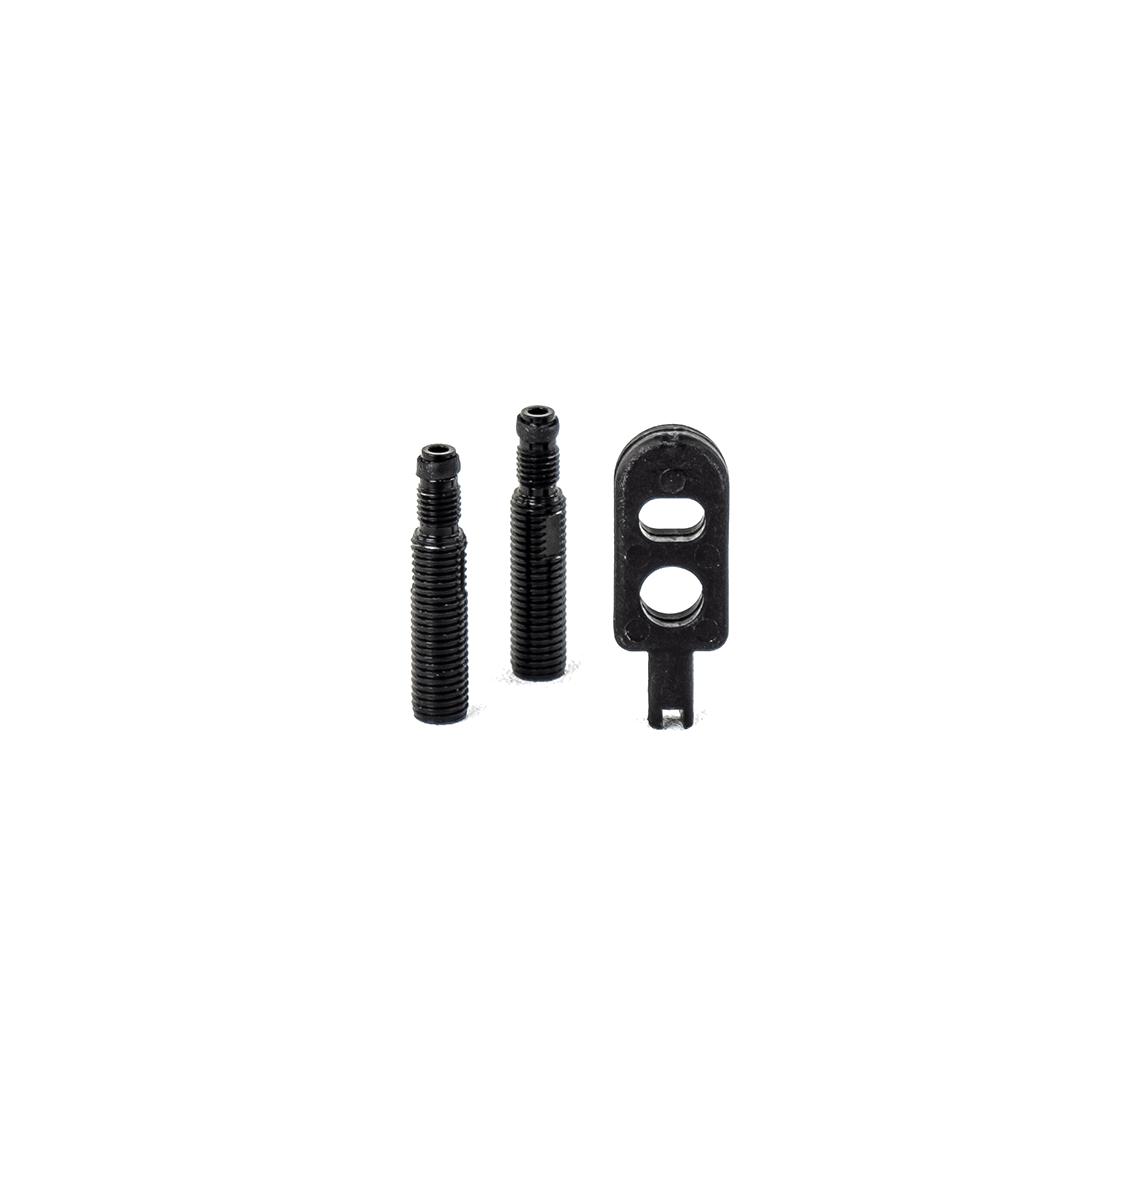 hutchinson-accessories-valve-extenders-3